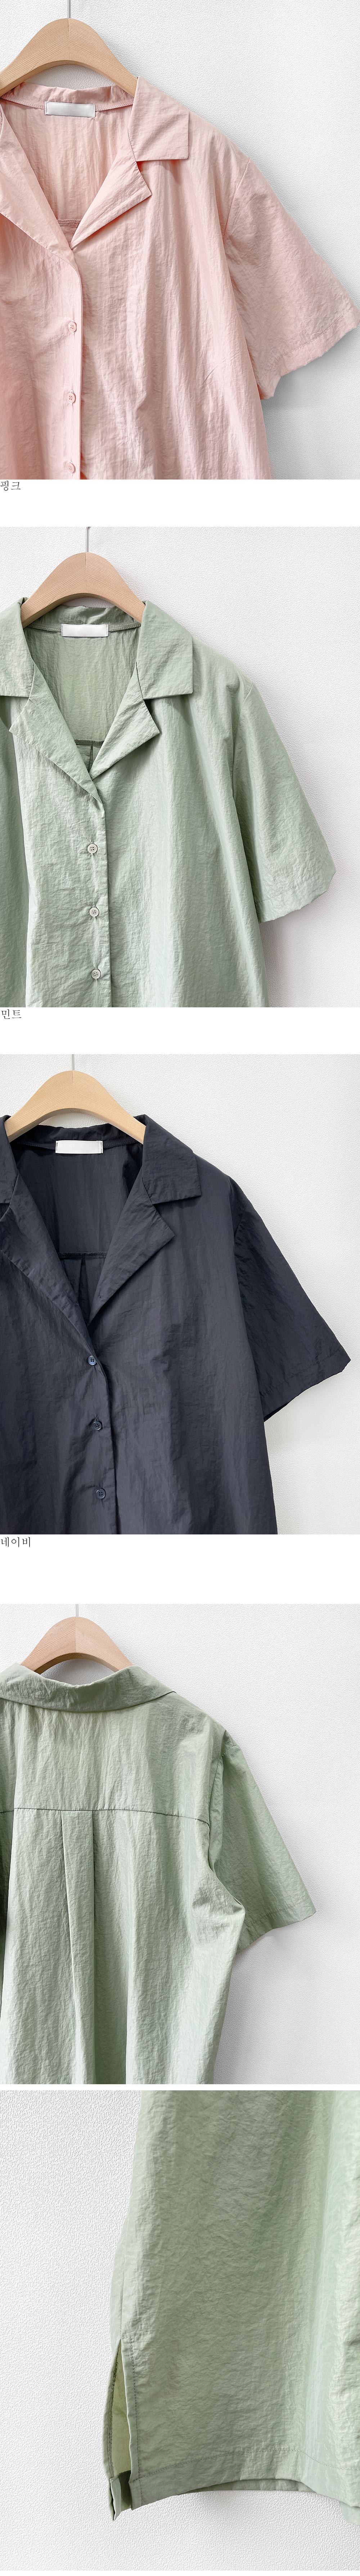 spin collar shirt